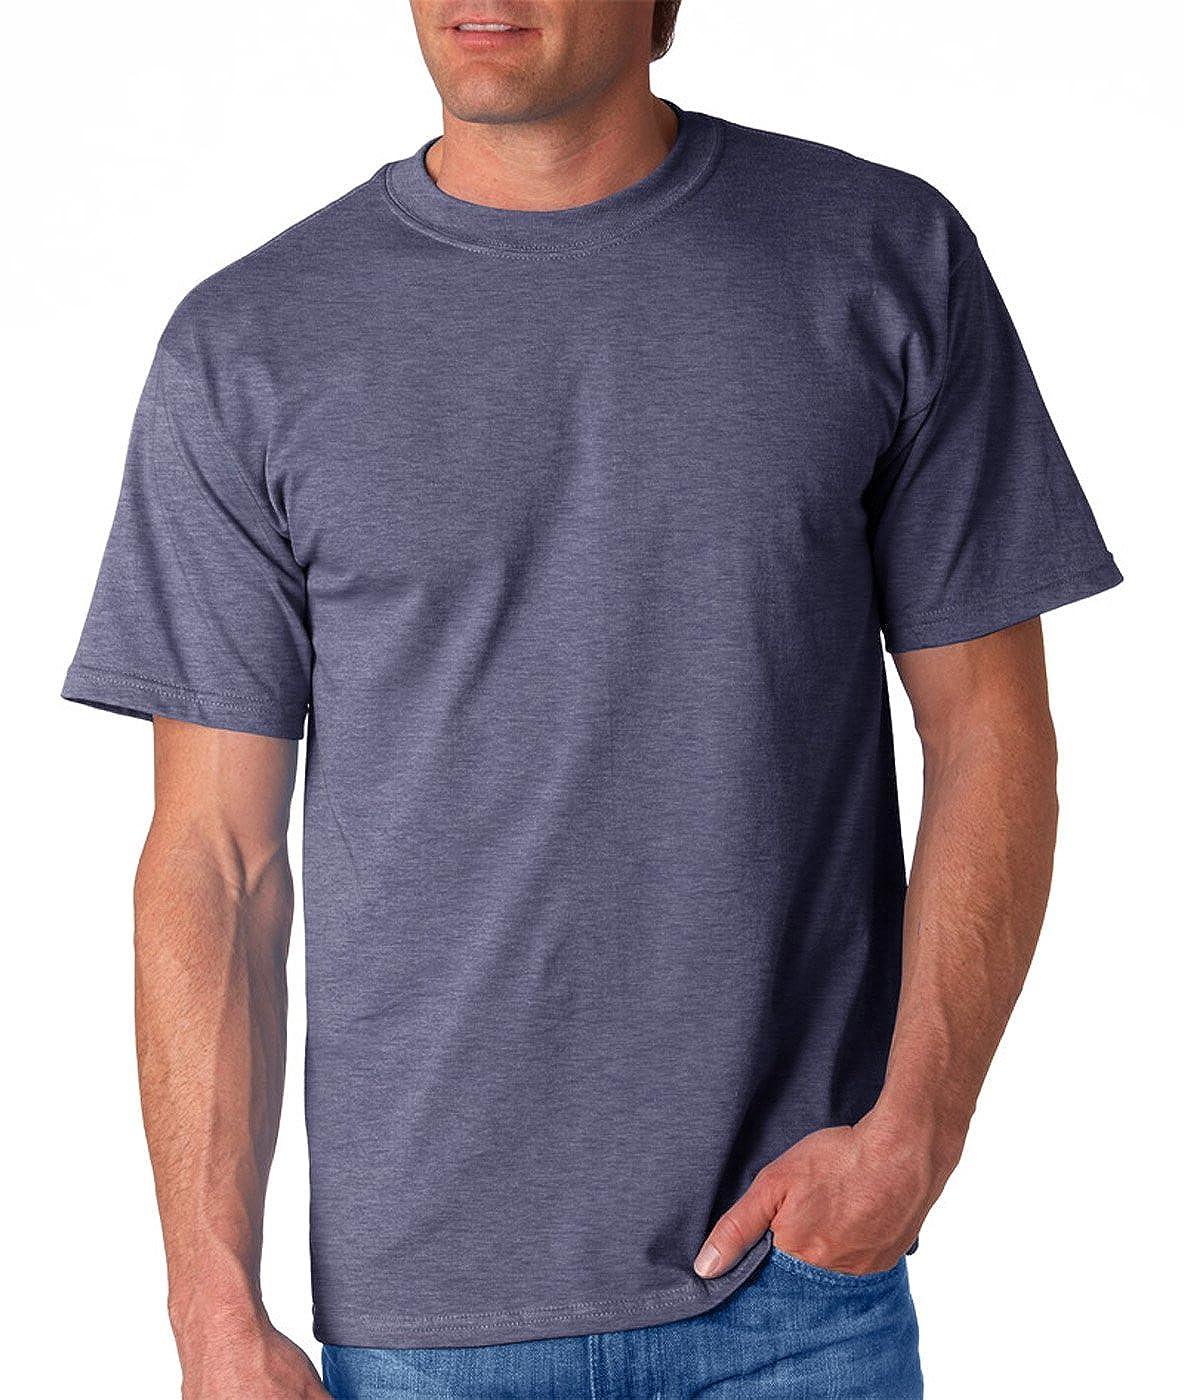 Gildan mens ultra cotton 6 oz t shirtg200 amazon nvjuhfo Choice Image